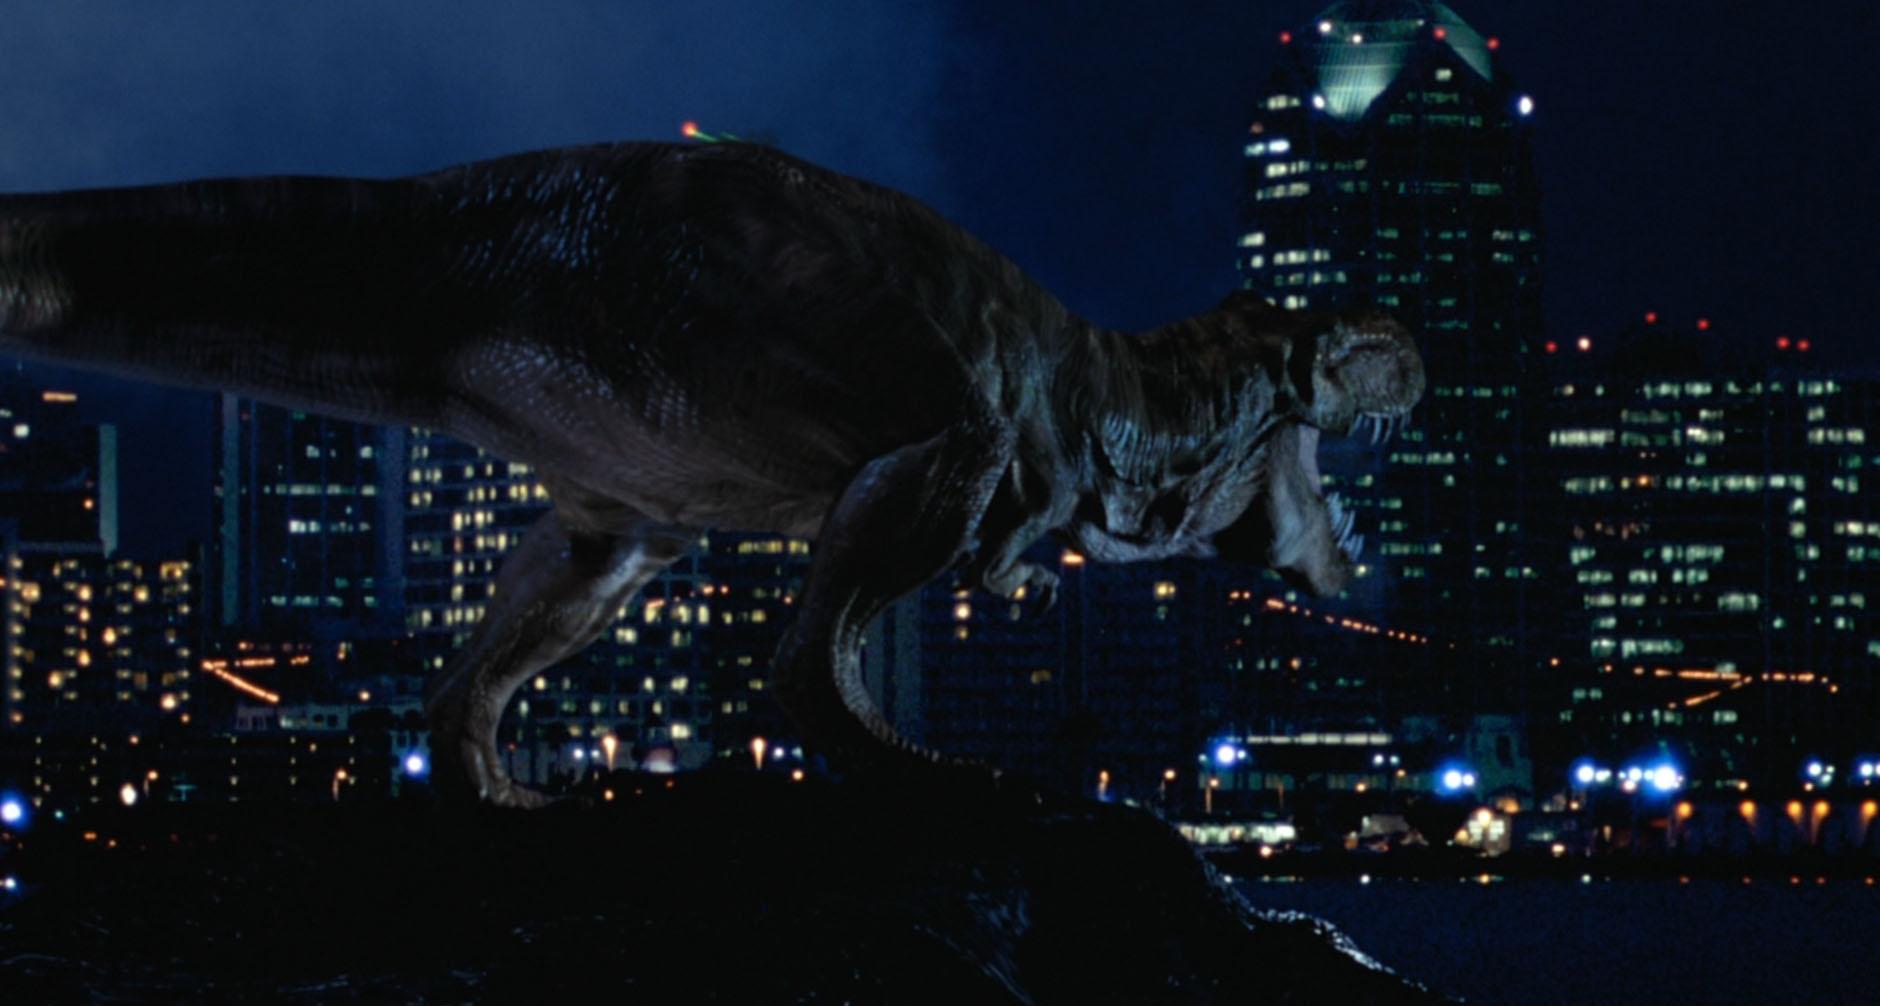 Il mondo perduto - Jurassic Park: il T-Rex a San Diego